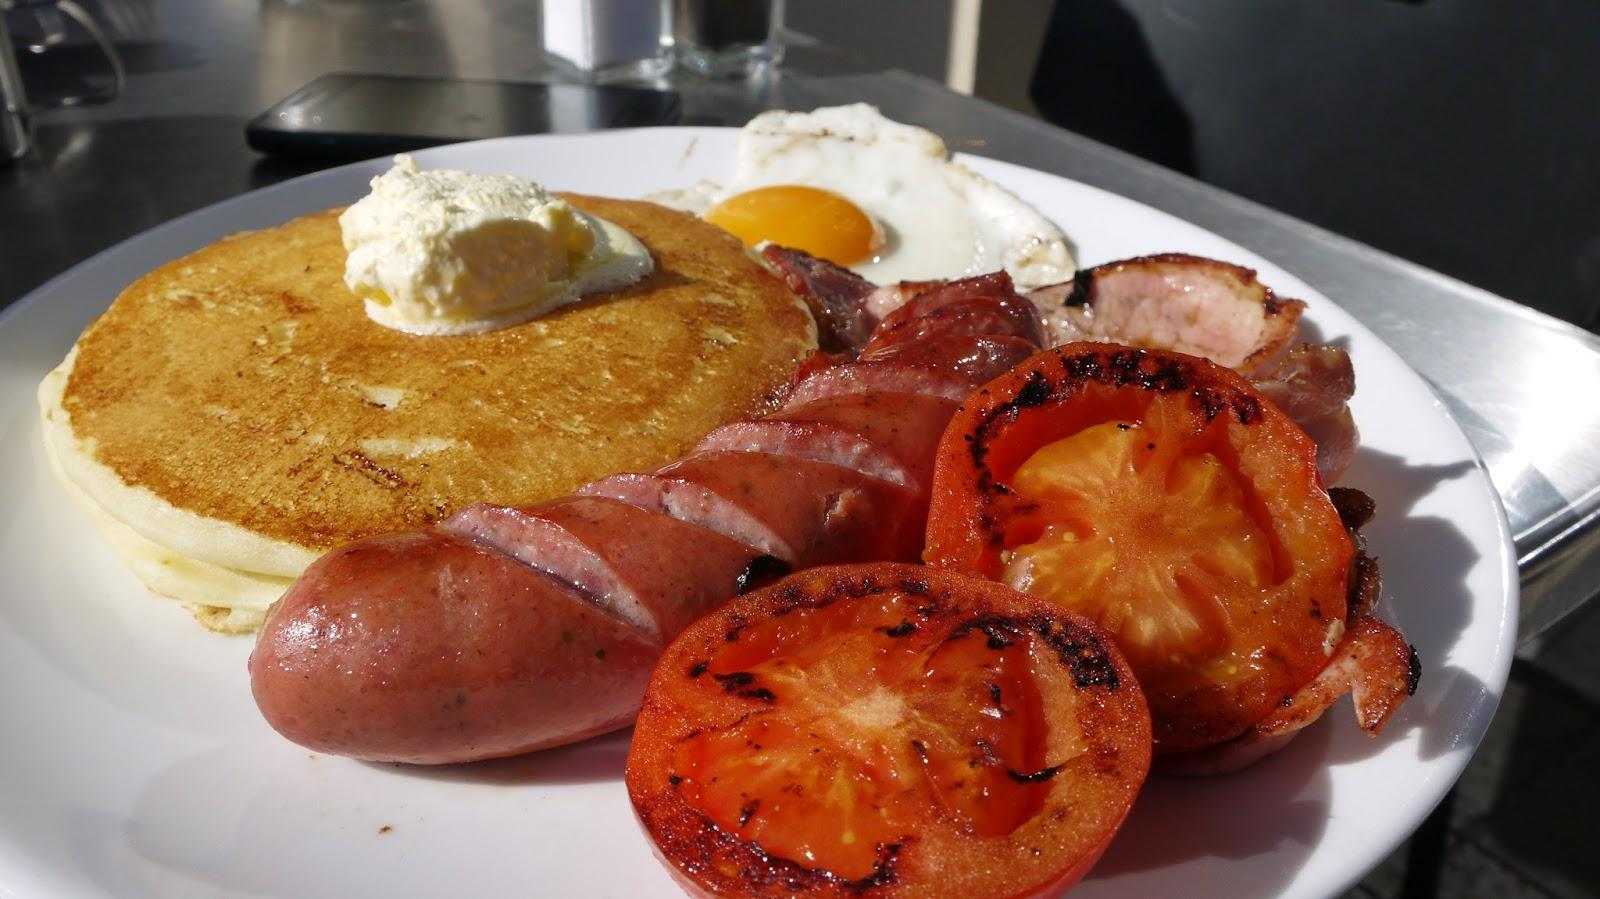 Pancakes, Brunch, Breakfast, Dessert, Port Adelaide, Food, Adelaide, Potatoes, Hash Browns